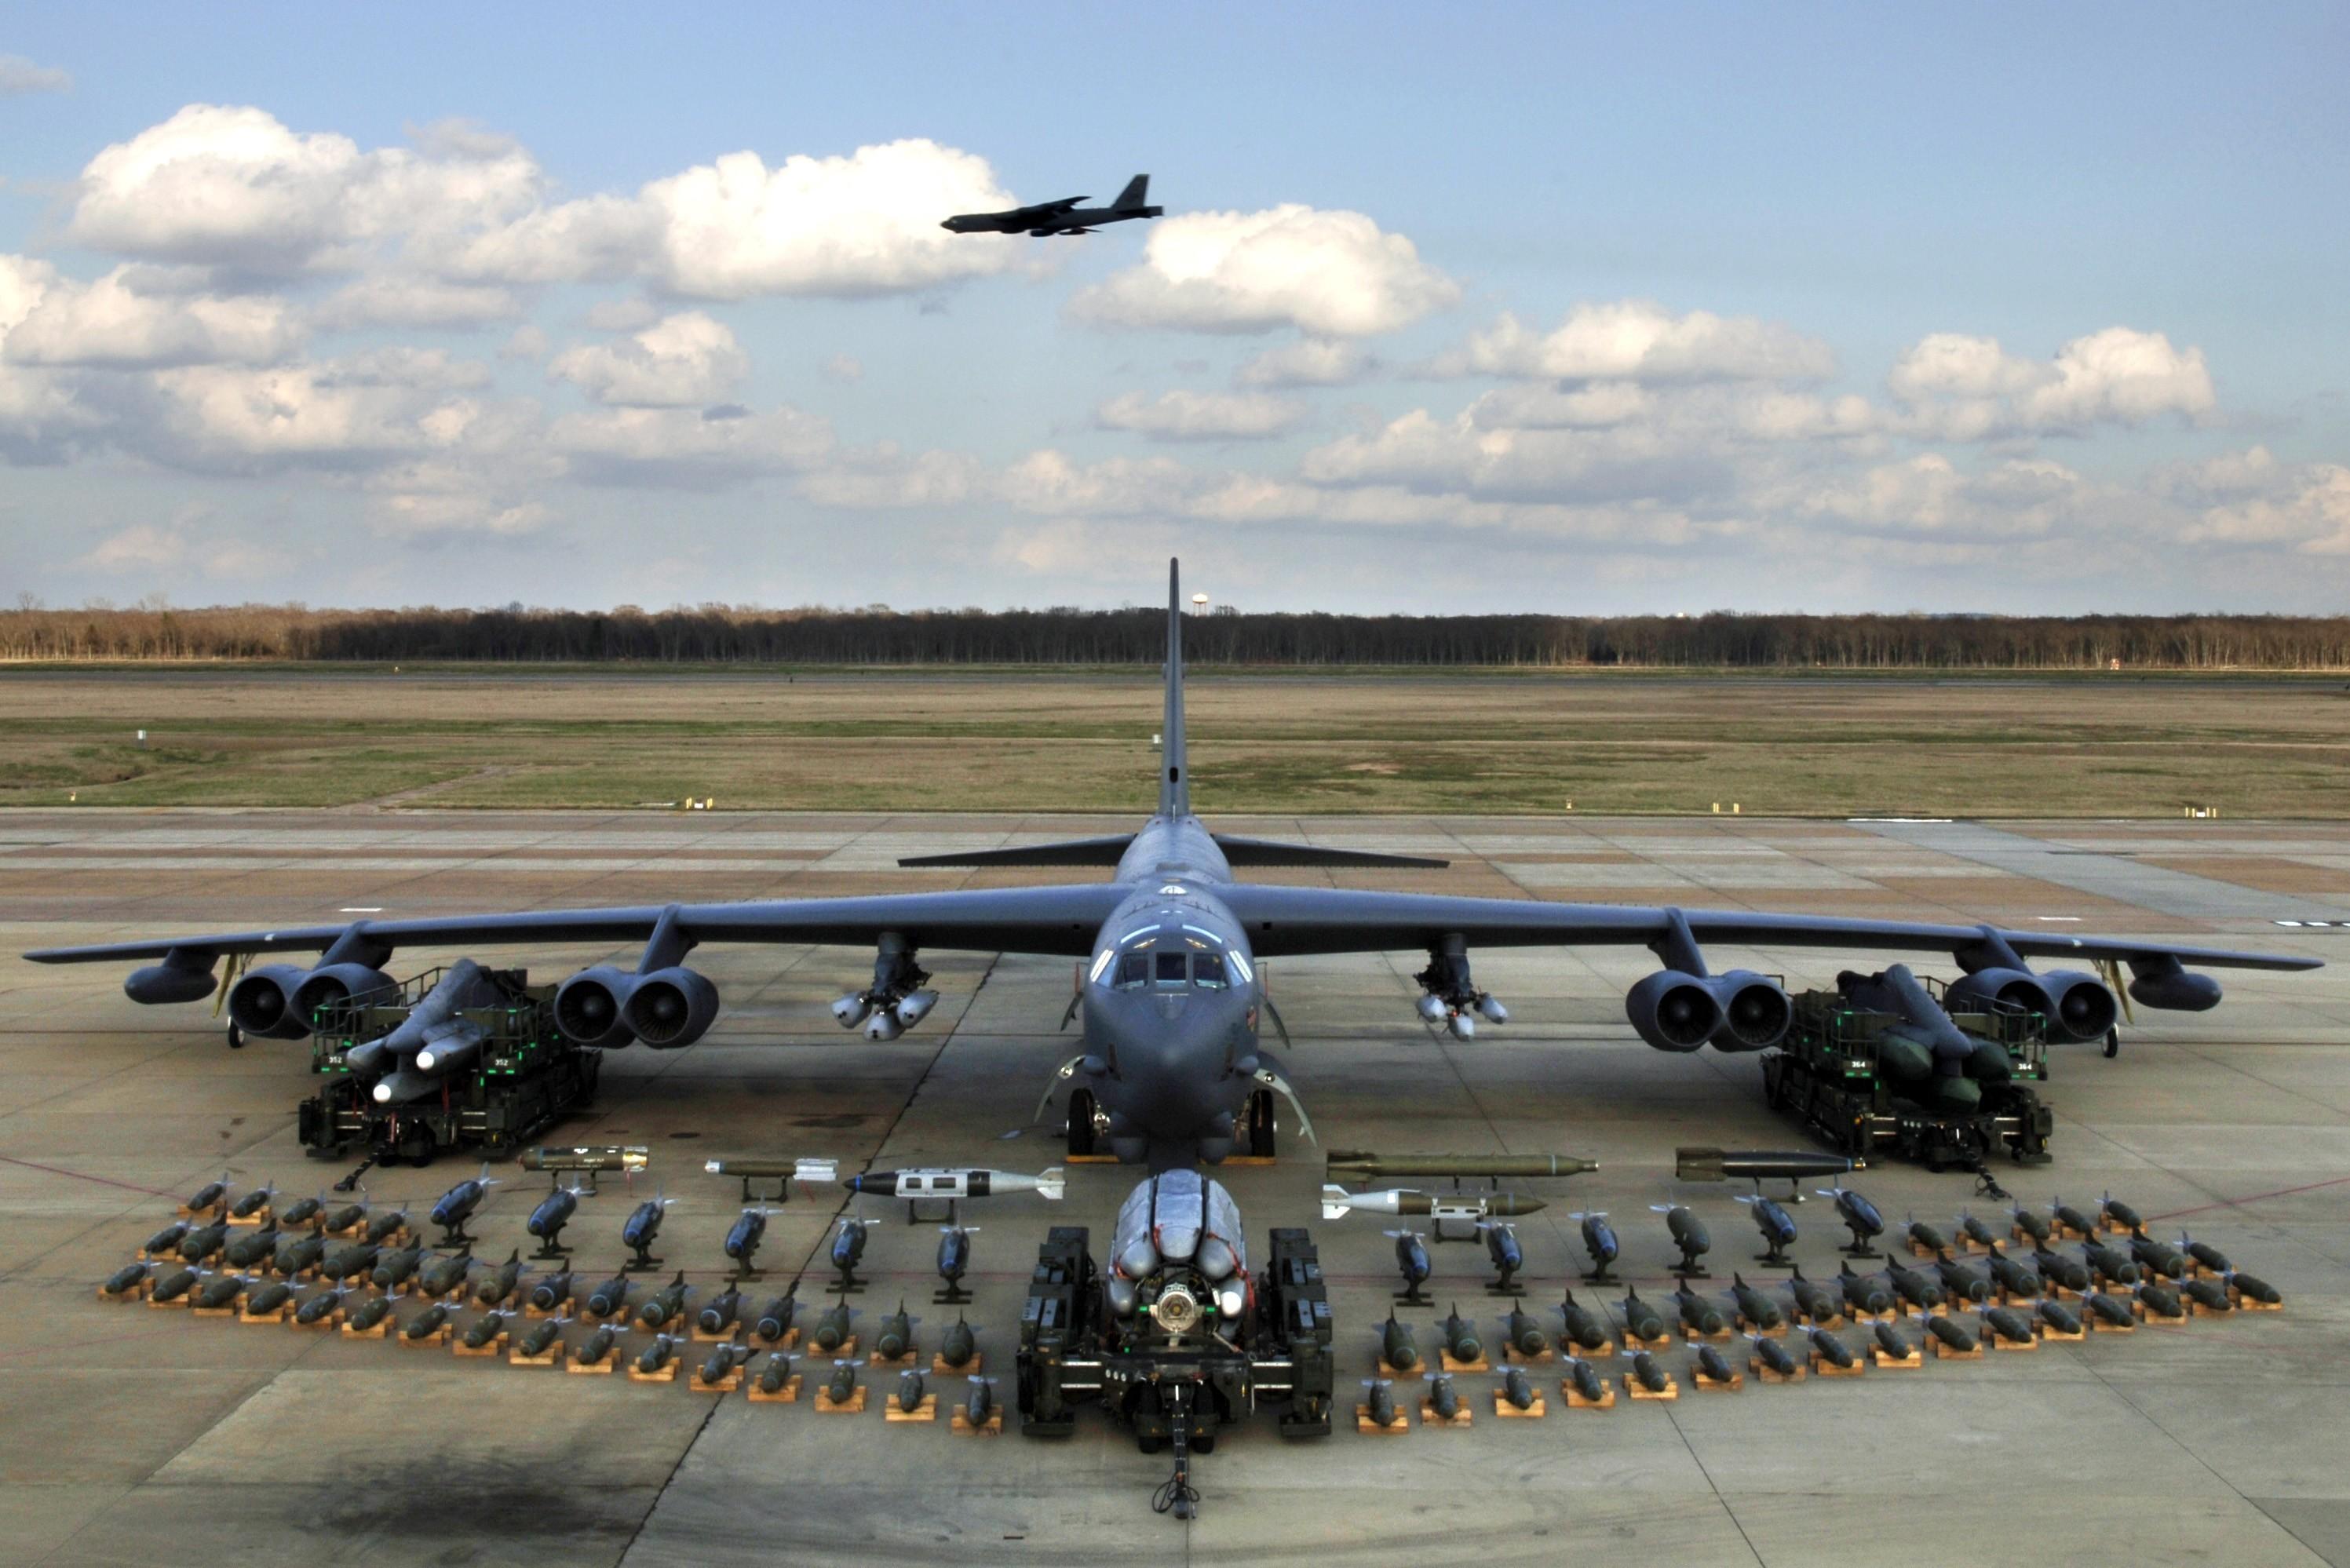 understanding how a jet aircraft lifts its heavy weight